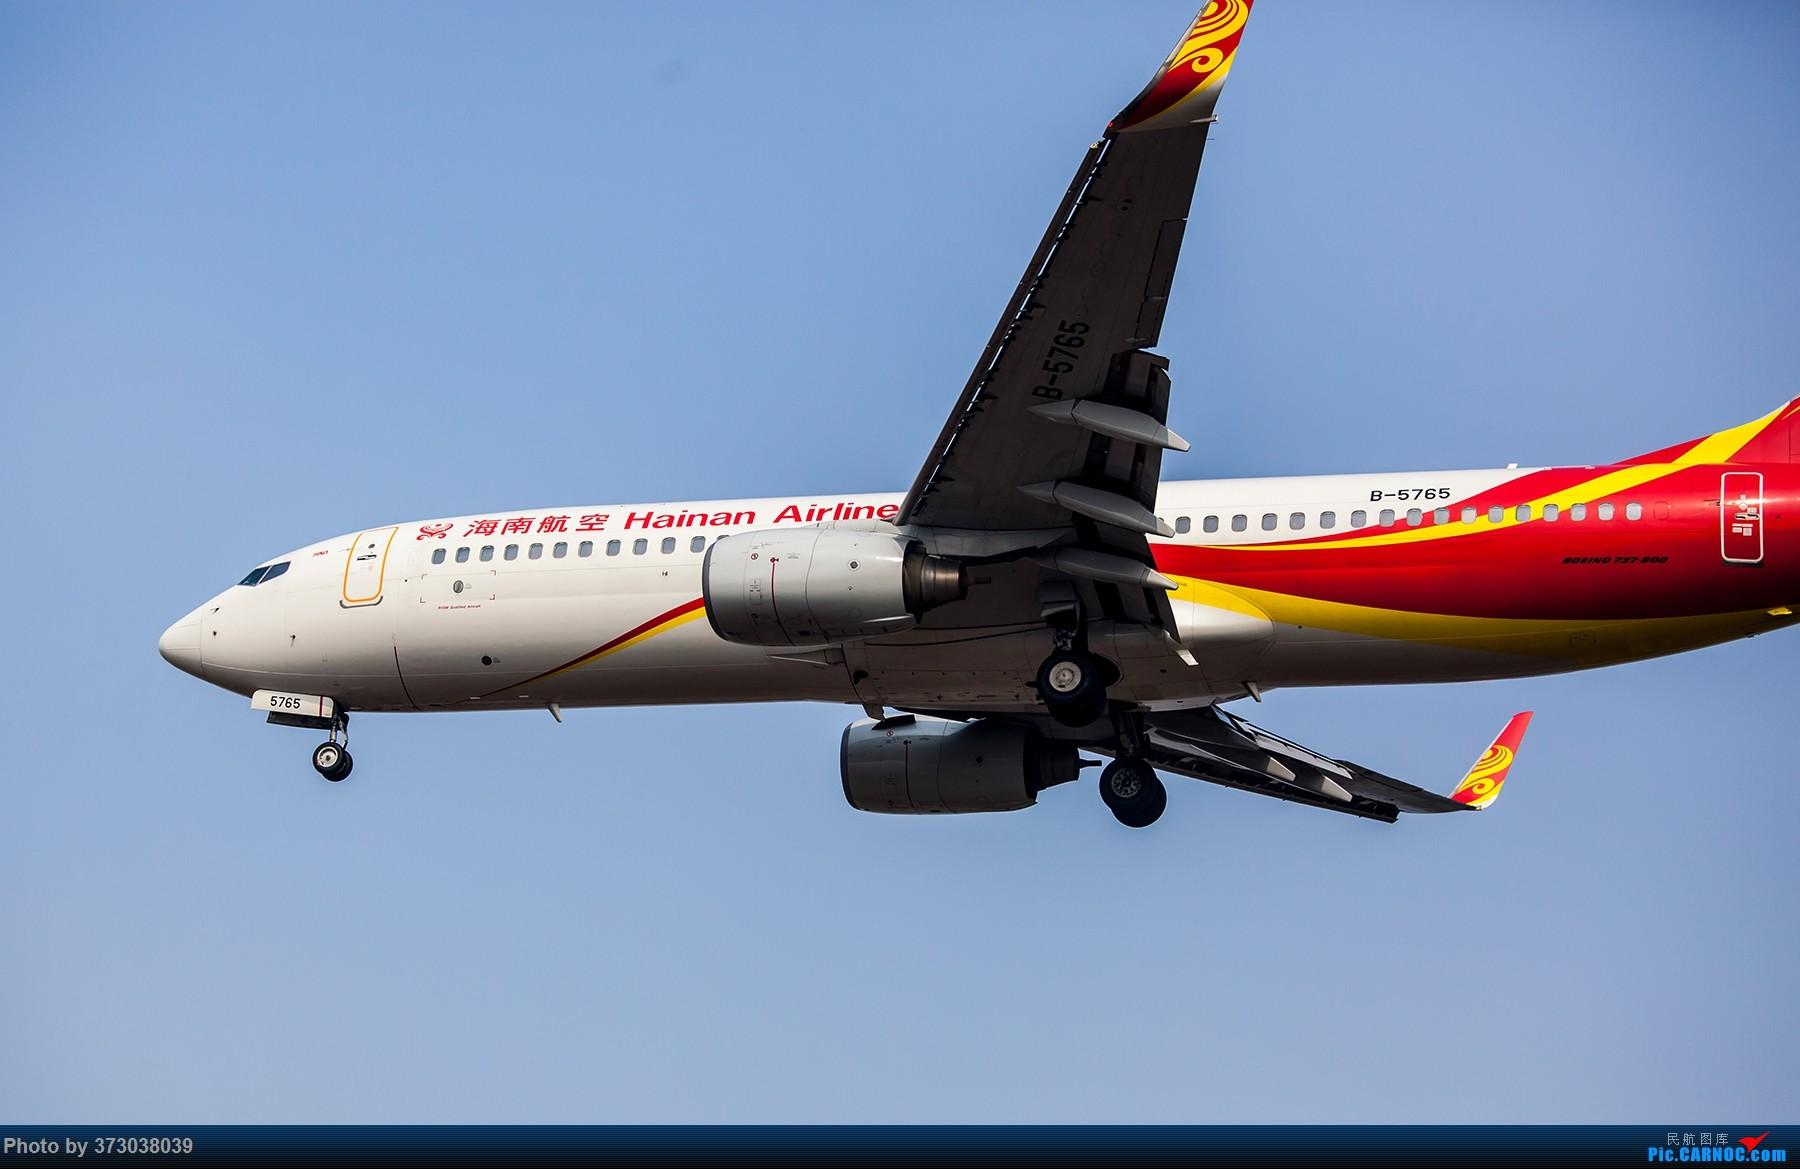 Re:[原创]【杭州飞友会】A320Neo迪士尼杭州萧山机场拍机班门弄斧记 BOEING 737-800 B-5765 中国杭州萧山国际机场